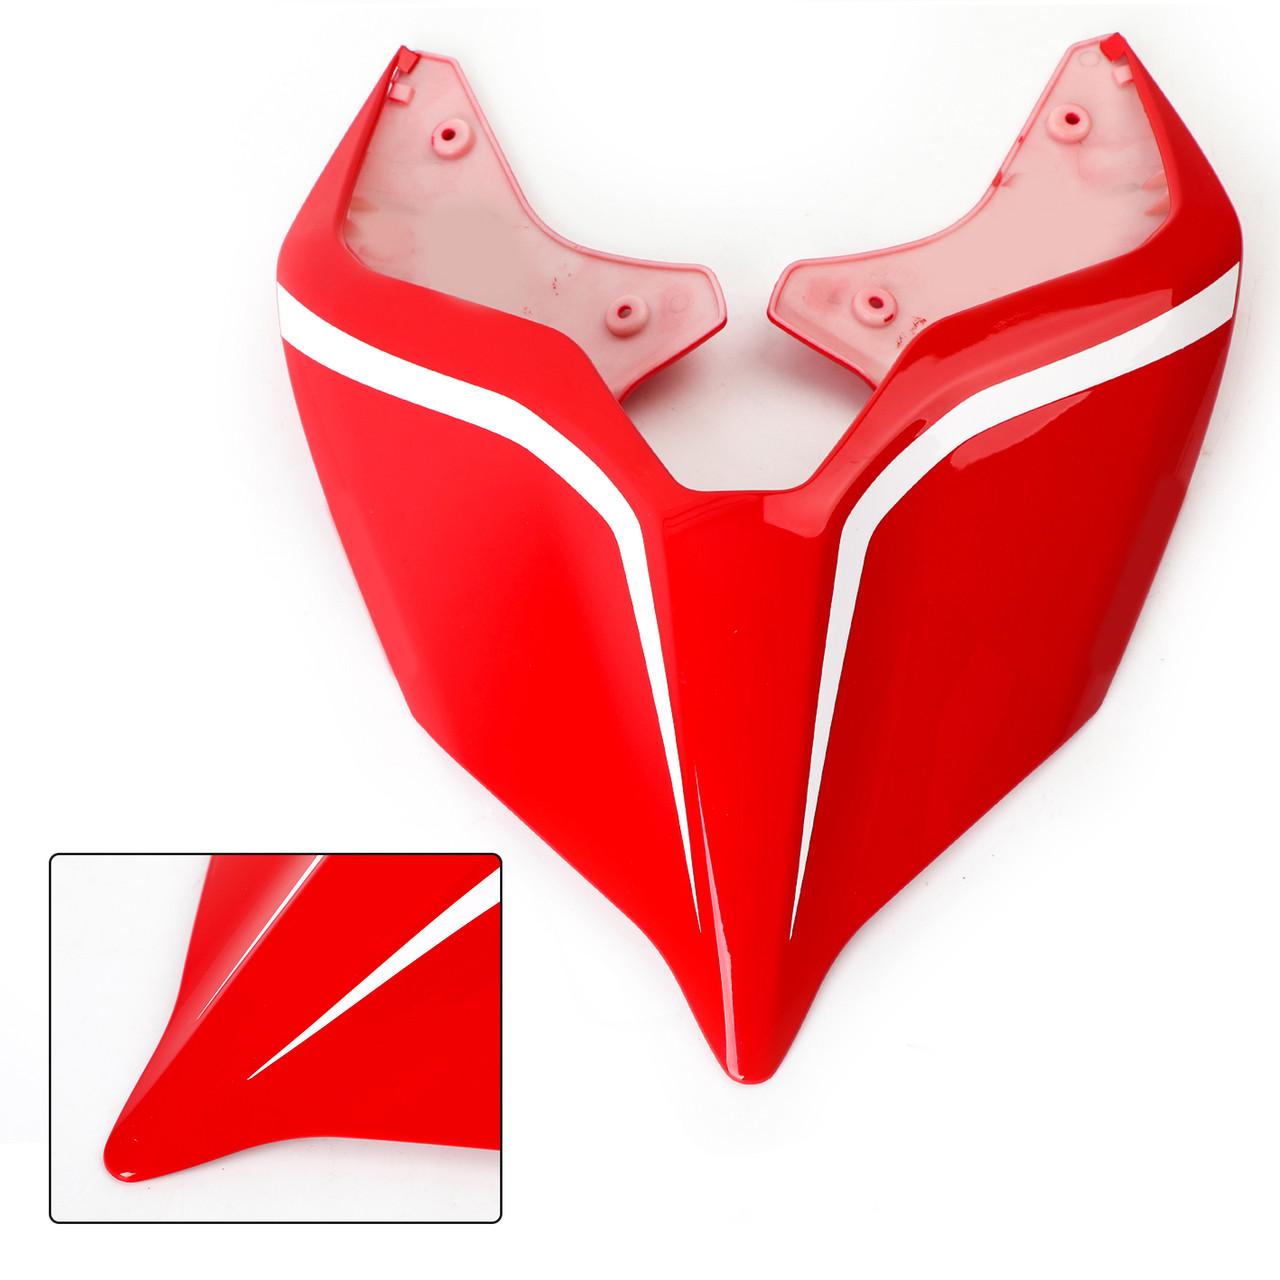 Cover Tail Fit for Ducati Panigale V4 V4S V4R 18-19 RWhite